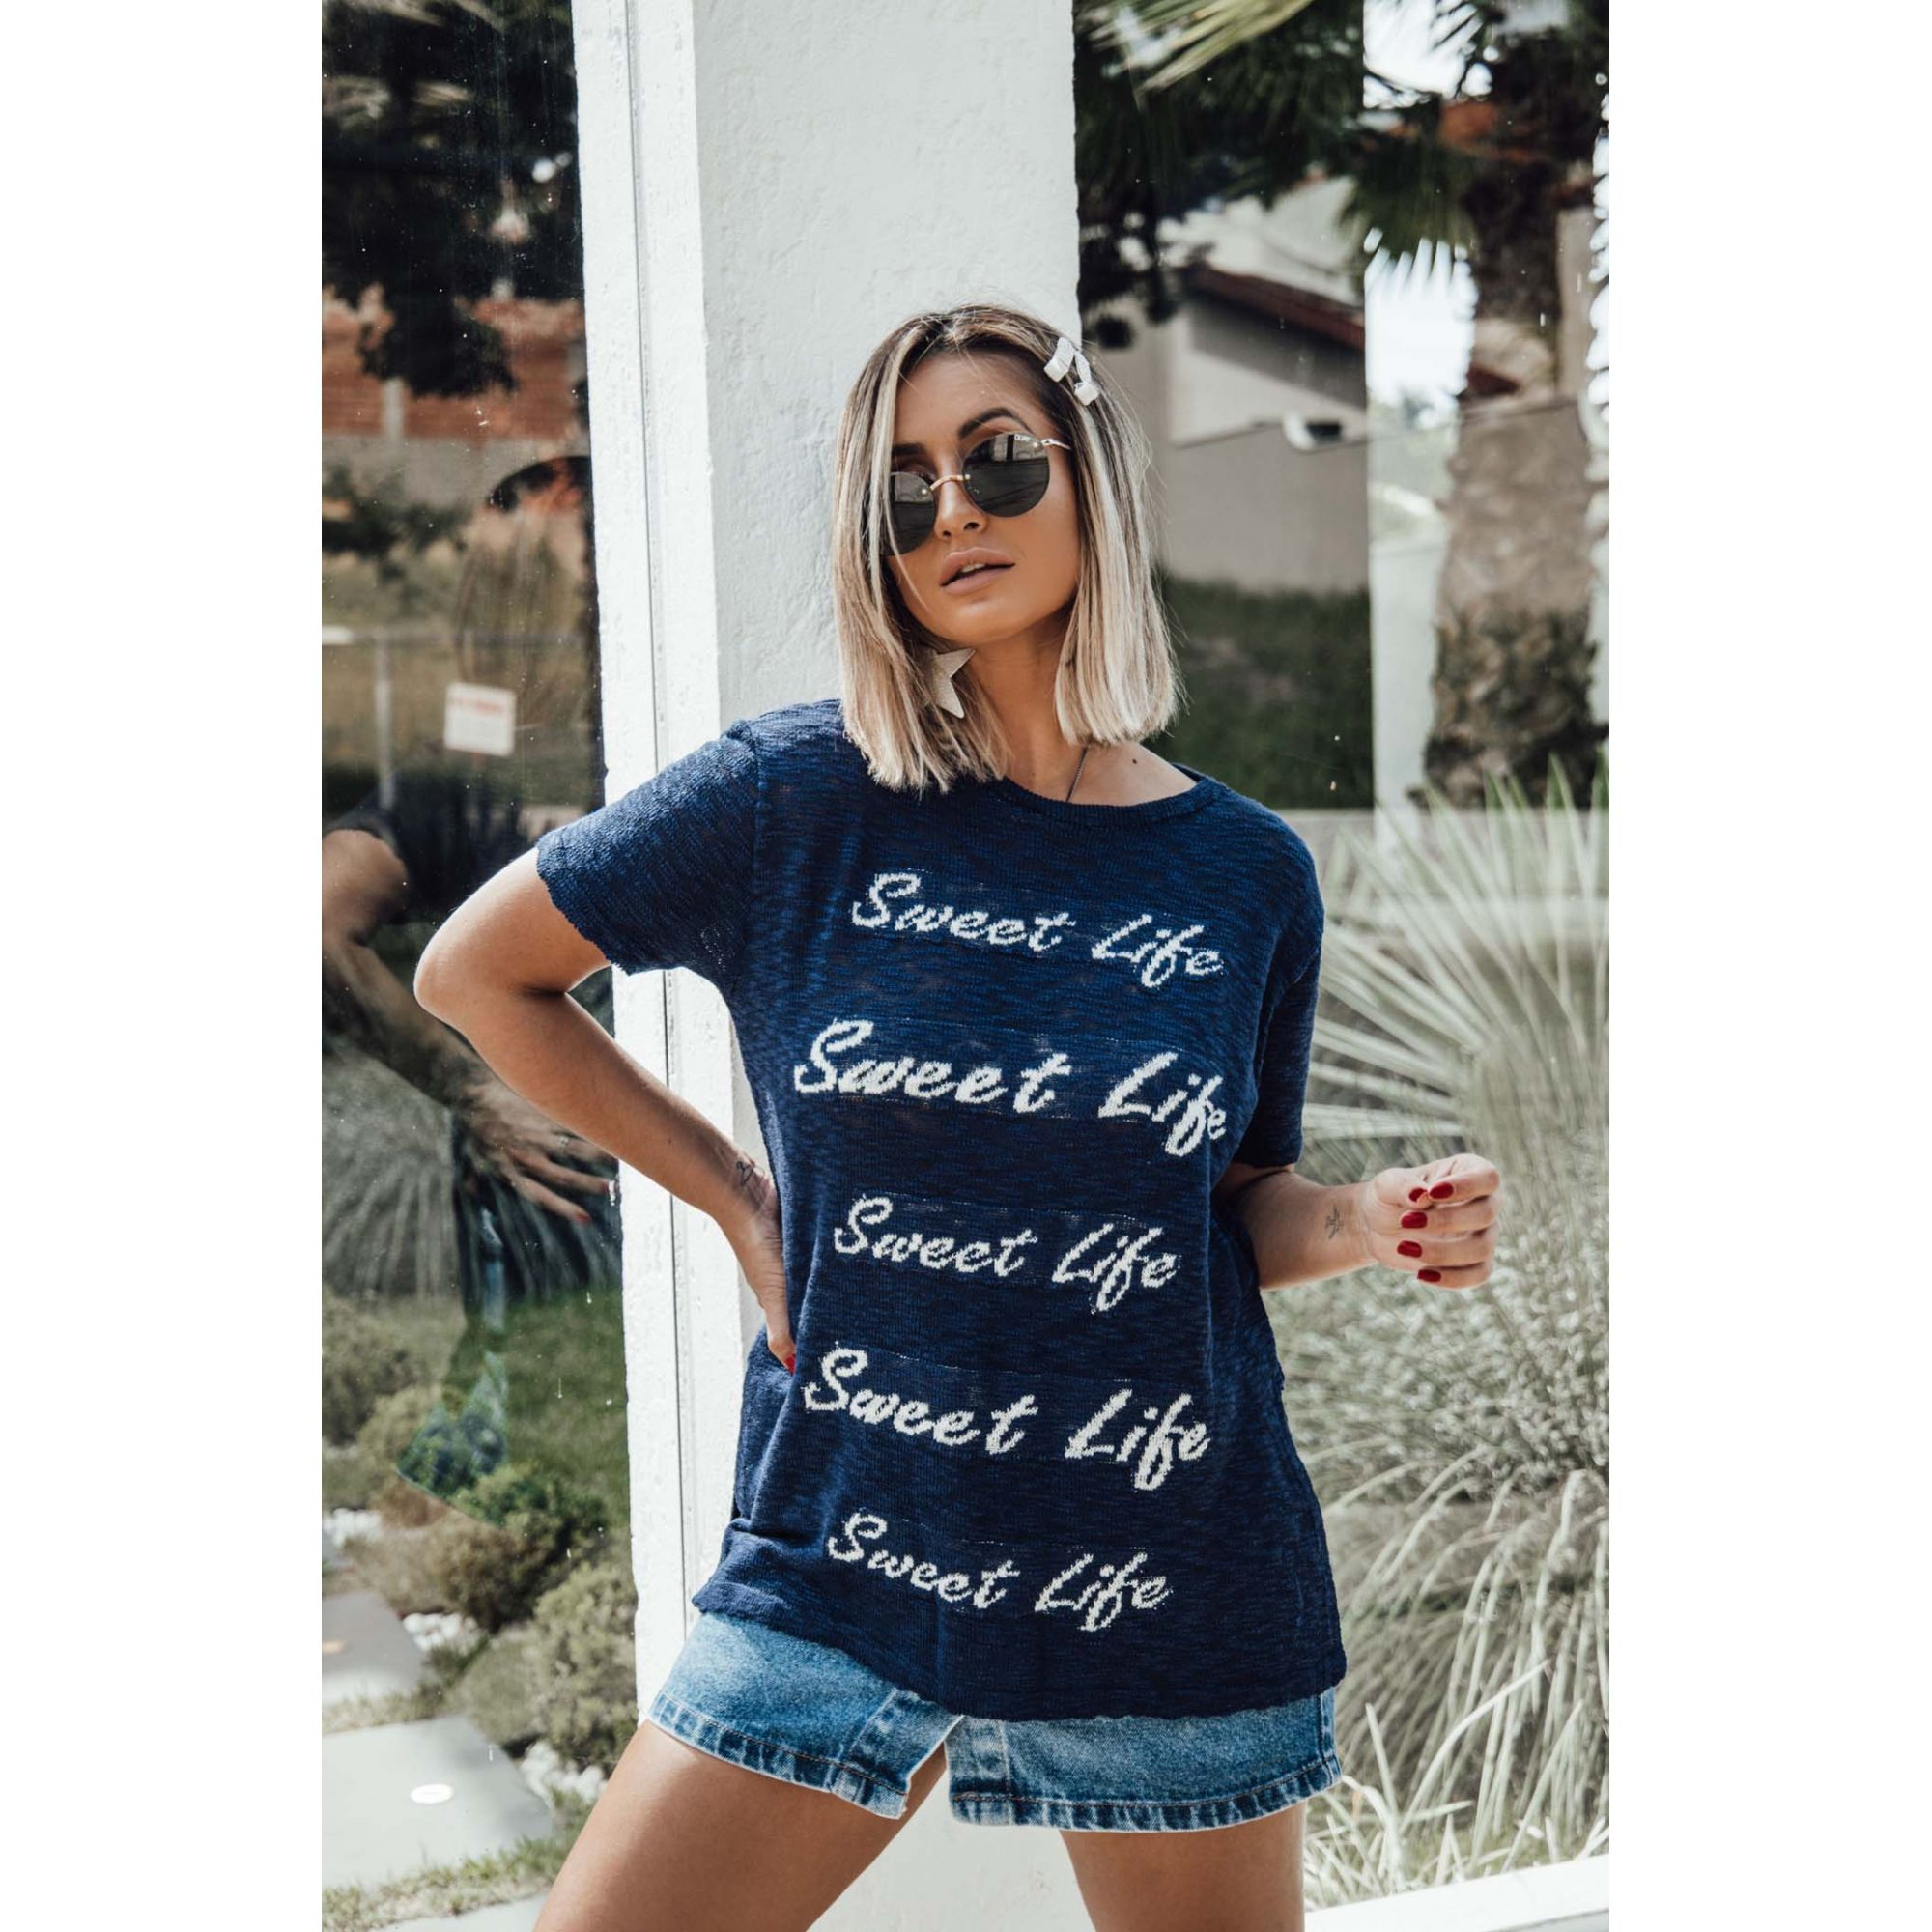 Blusa Manga Curta Frases Vera Tricot Feminino Azul